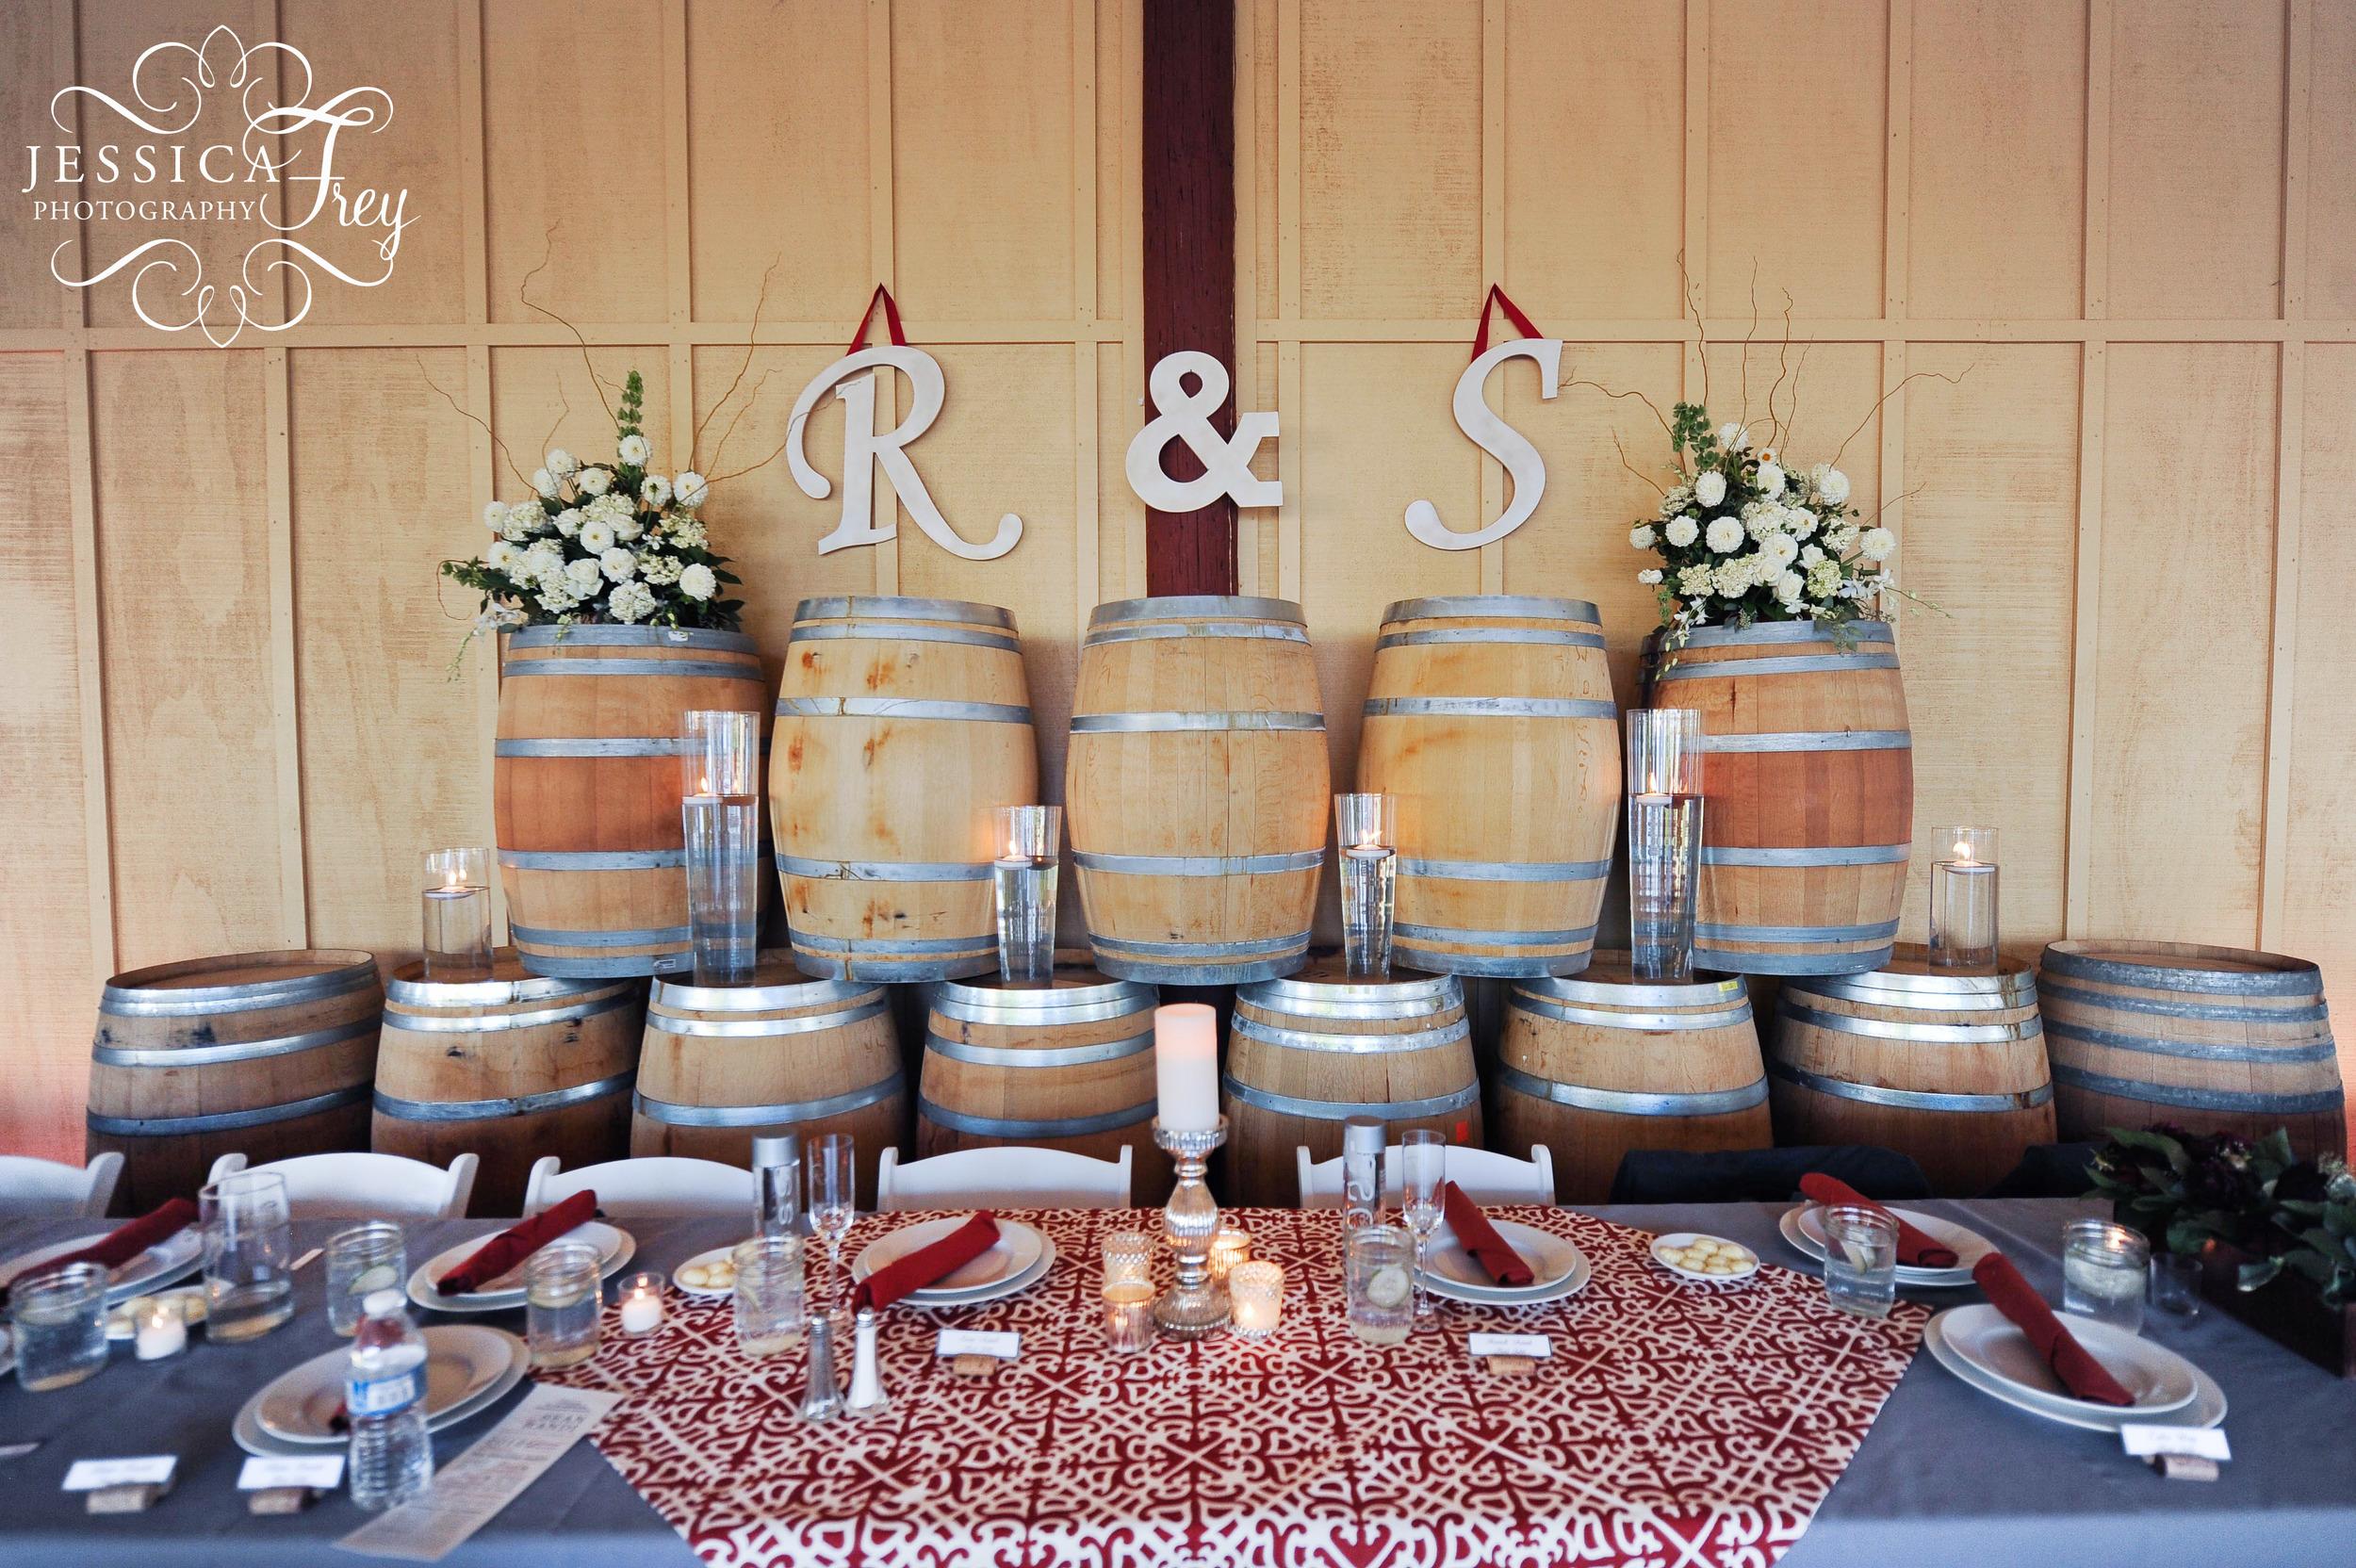 Jessica-Frey-Photography-winery-wedding-10.jpg